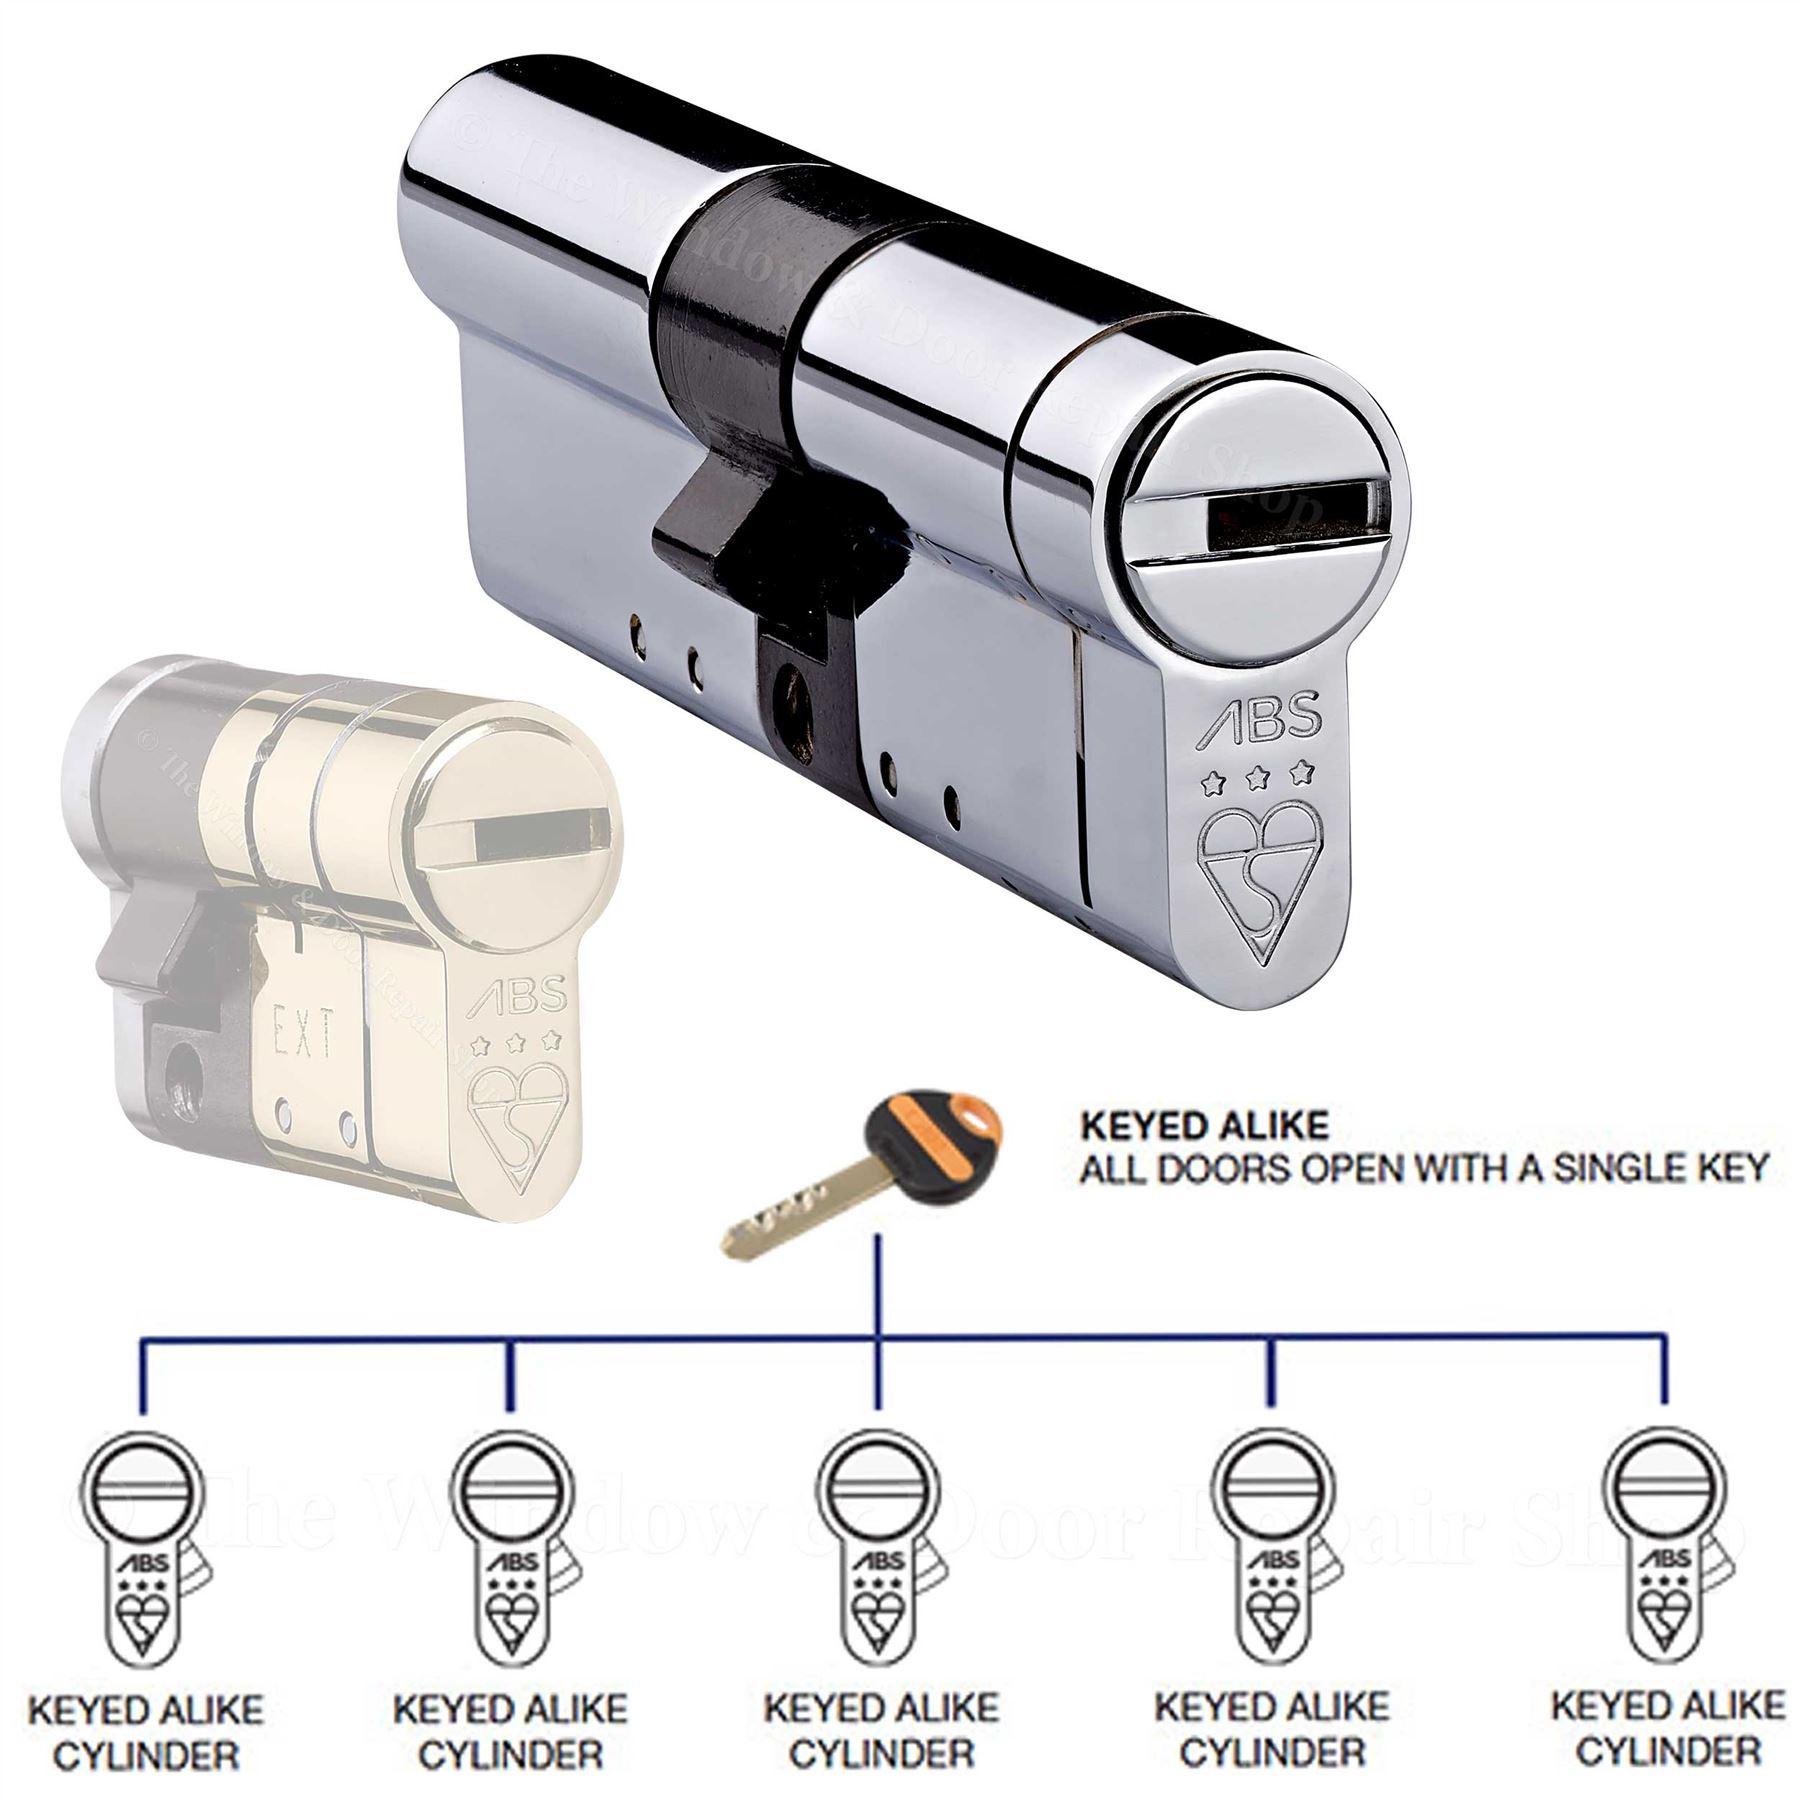 Avocet abs keyed alike euro cylinder upvc door lock anti for 007 door locks